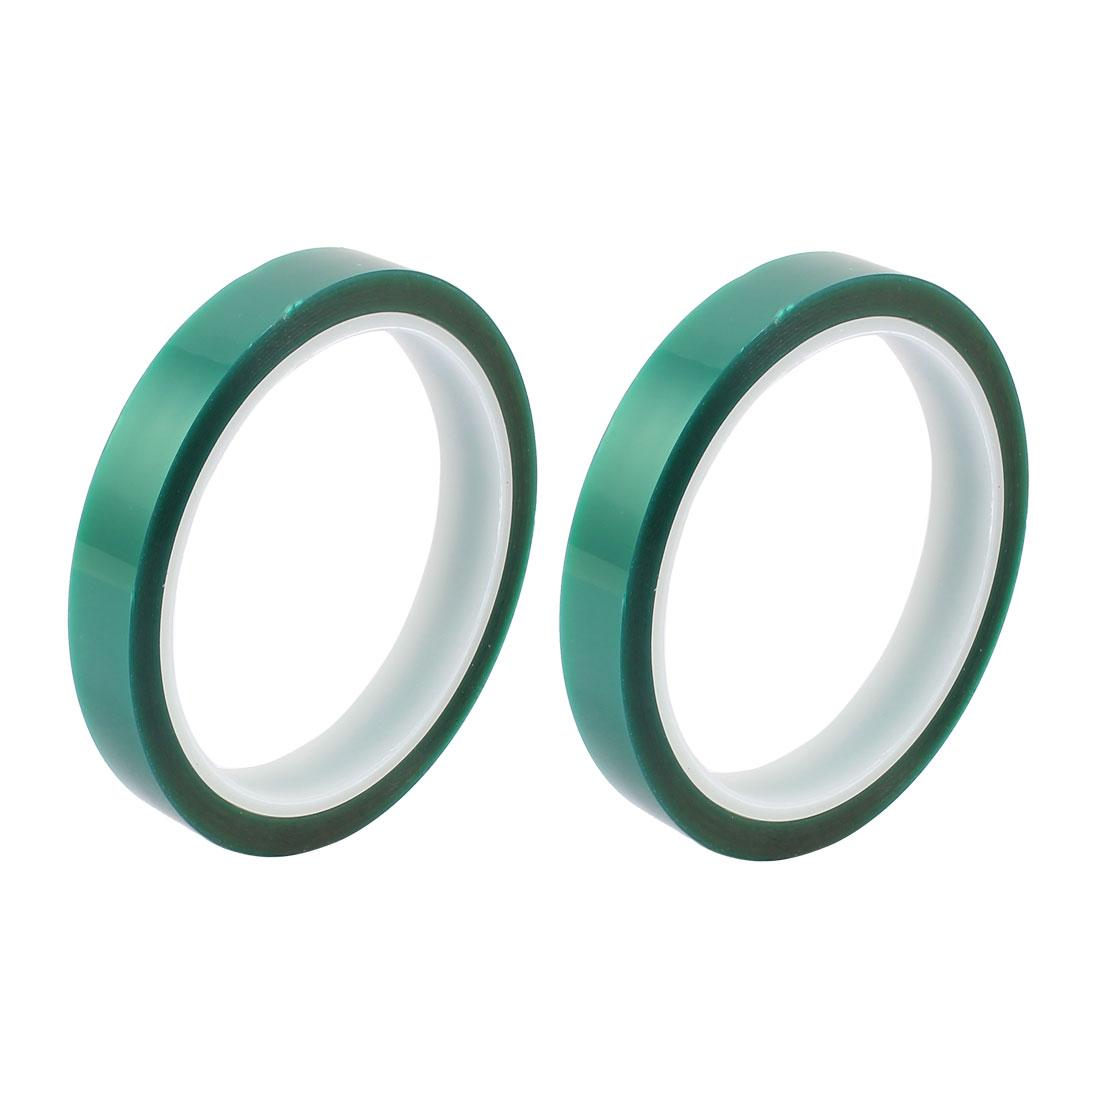 2pcs 15mm Width 33M Long Green PET High Temperature Heat Resistant PCB Solder Tape